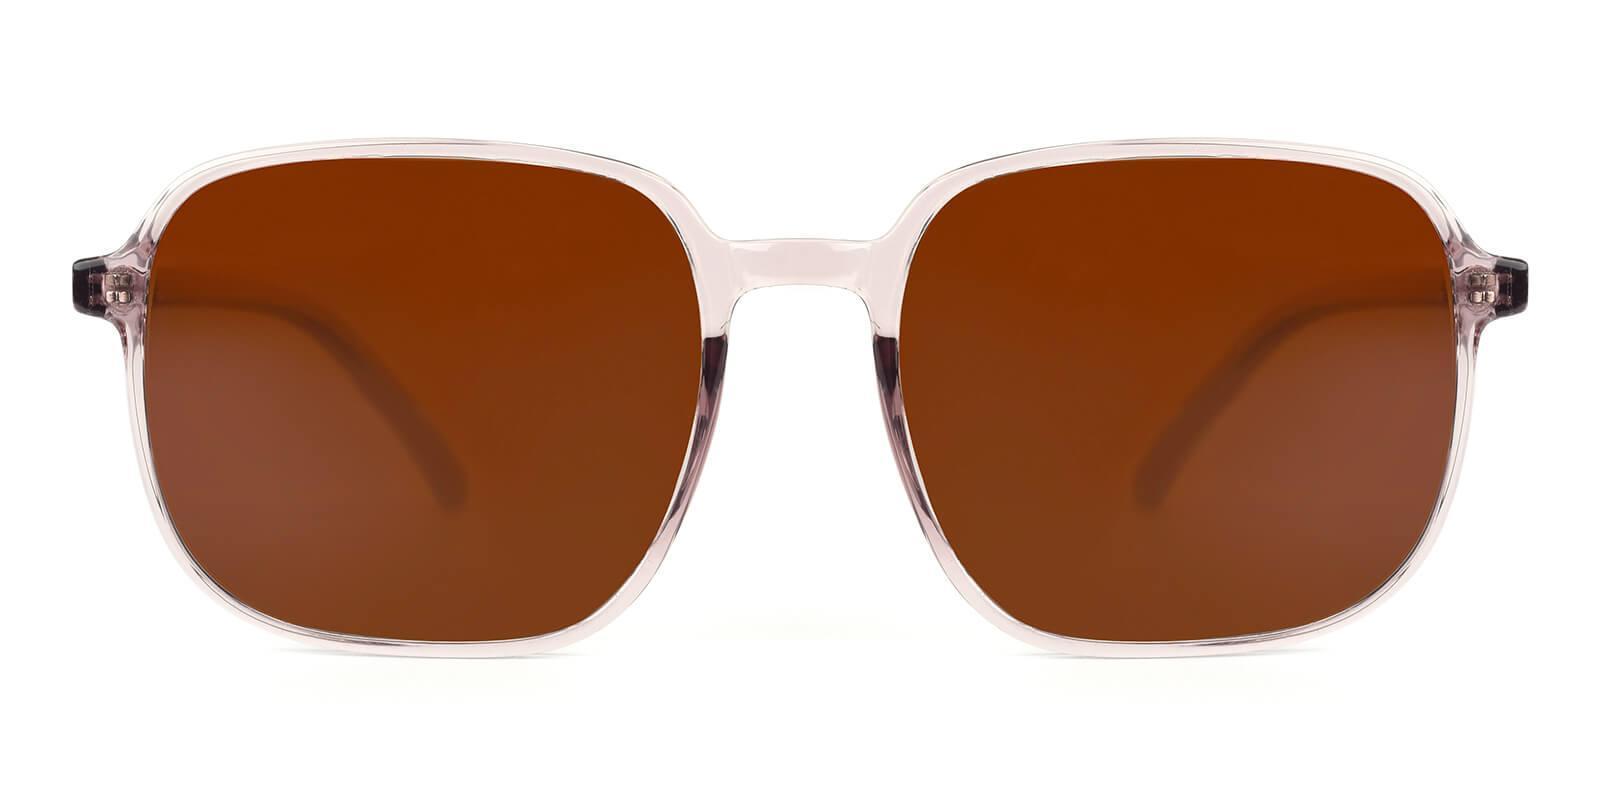 Terminal Purple TR Lightweight , Sunglasses , UniversalBridgeFit Frames from ABBE Glasses